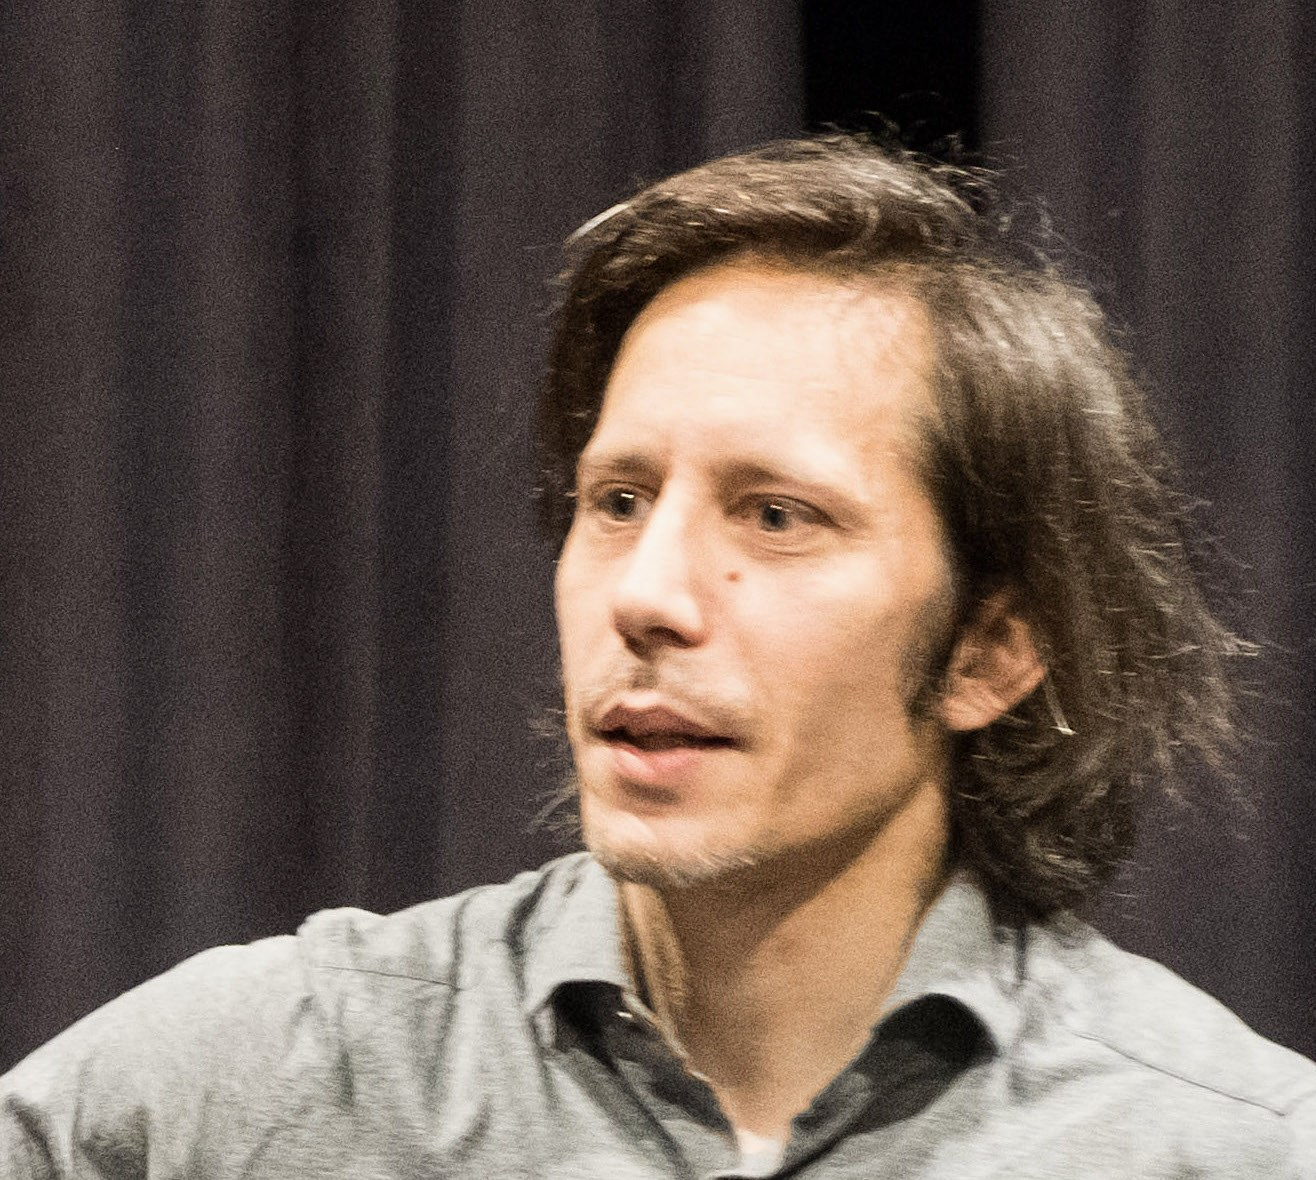 Marco Ferro